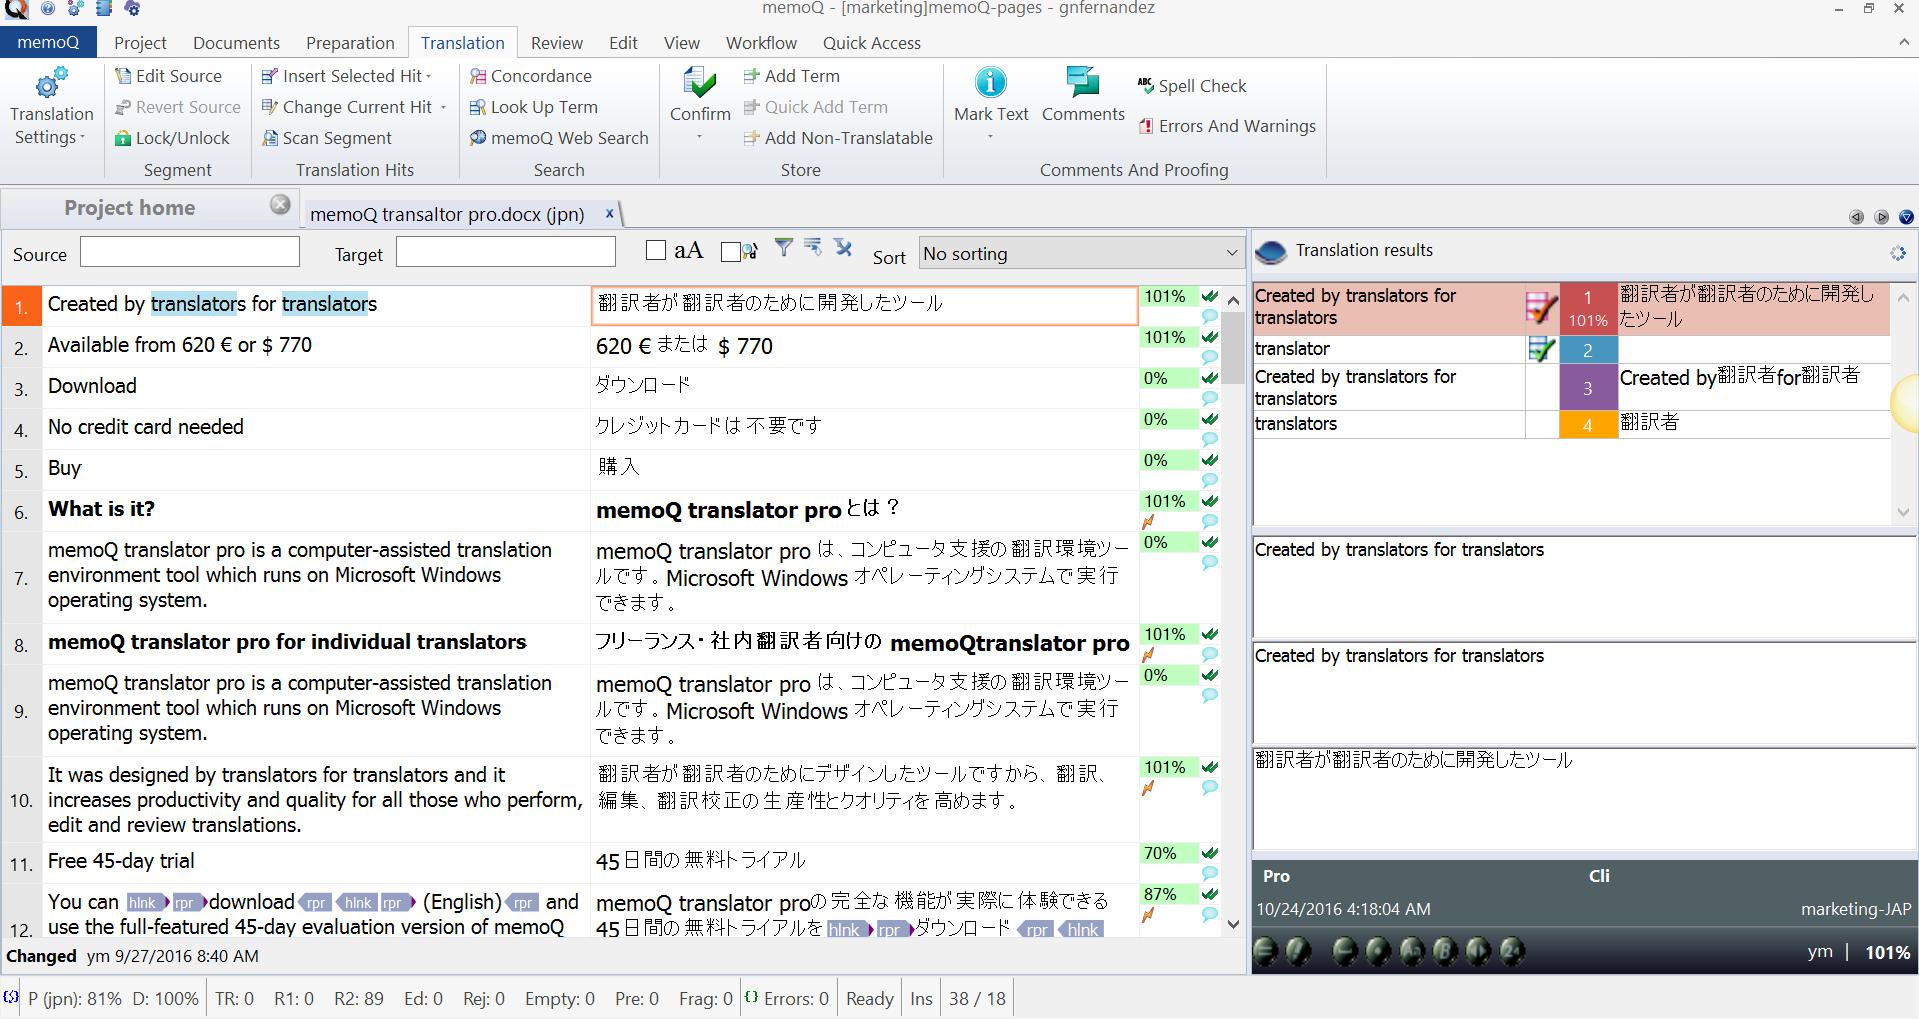 memoQ translator pro Demo - memoQ translator pro - translation interface